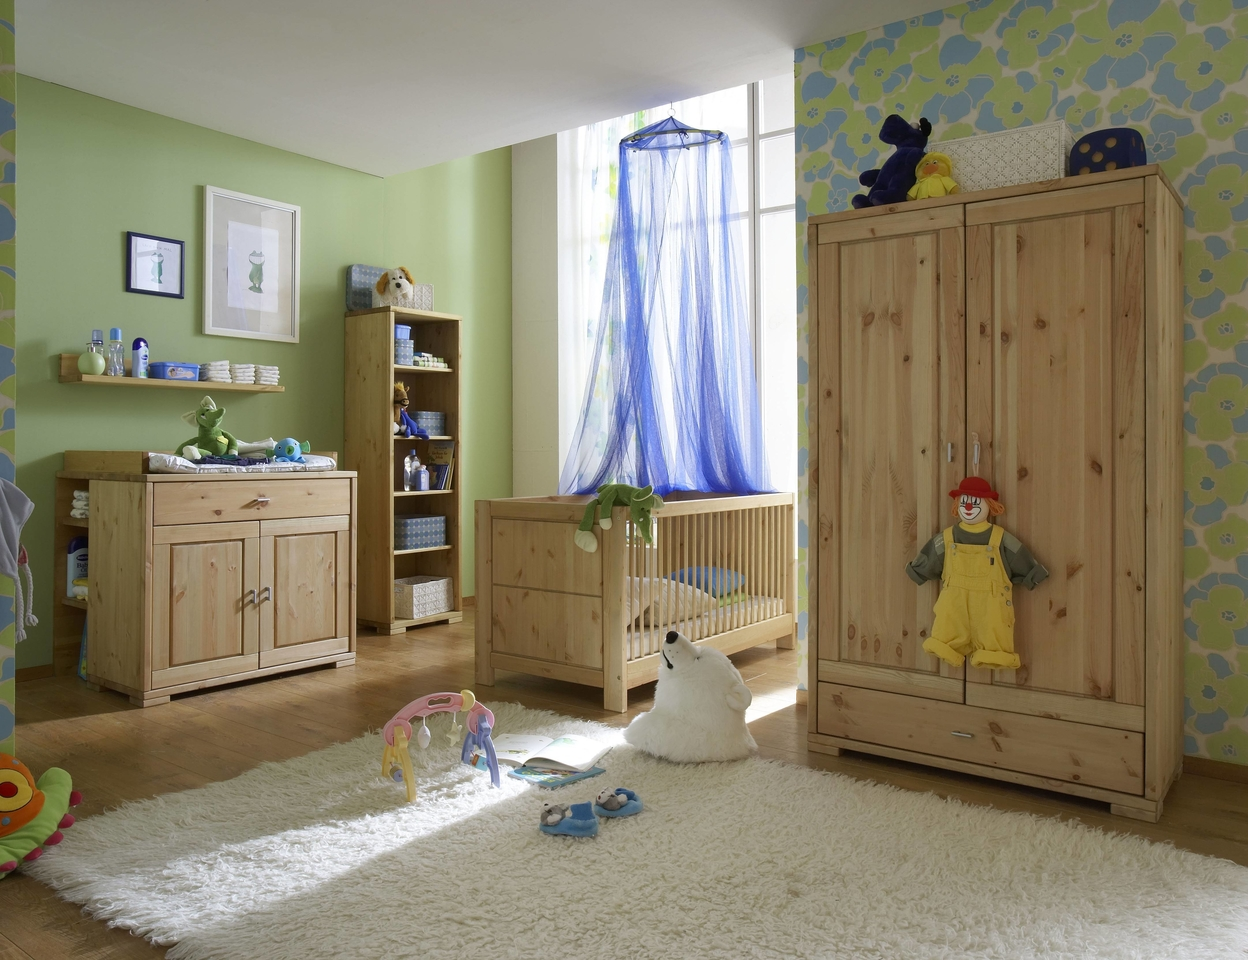 kinderzimmer guldborg kiefer massiv gelaugt ge lt von pinus g nstig bestellen skanm bler. Black Bedroom Furniture Sets. Home Design Ideas